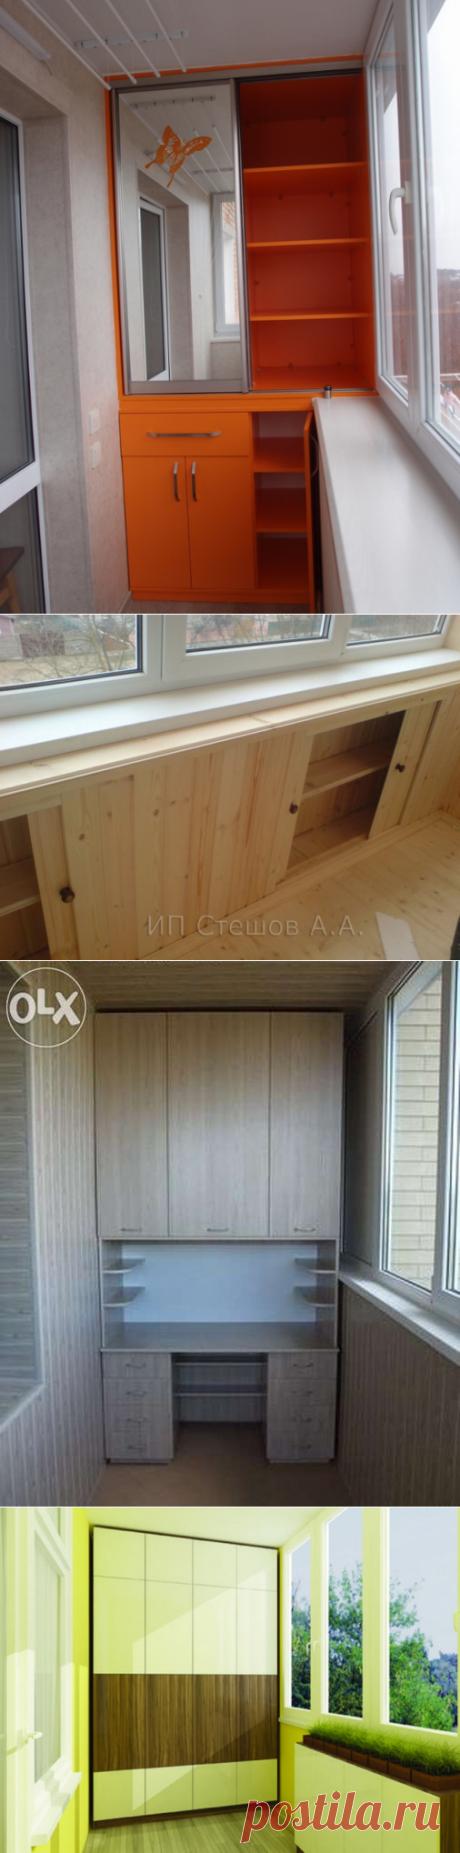 Шкафы и системы хранения на балкон